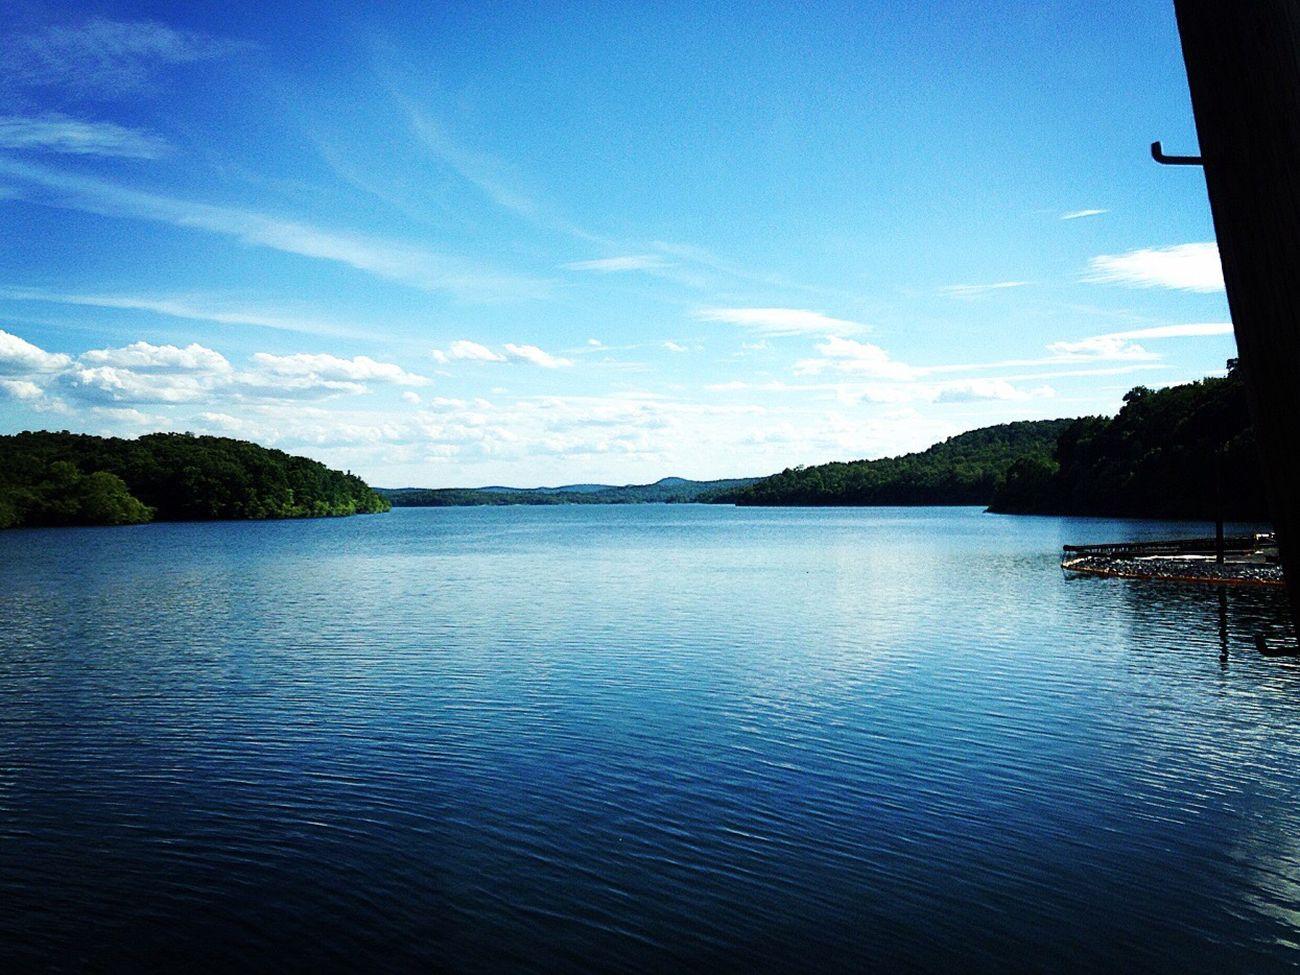 Wanaque Scenery Viewfrommyiphoneornikon Photography New Jersey Lake Lake Wanaque